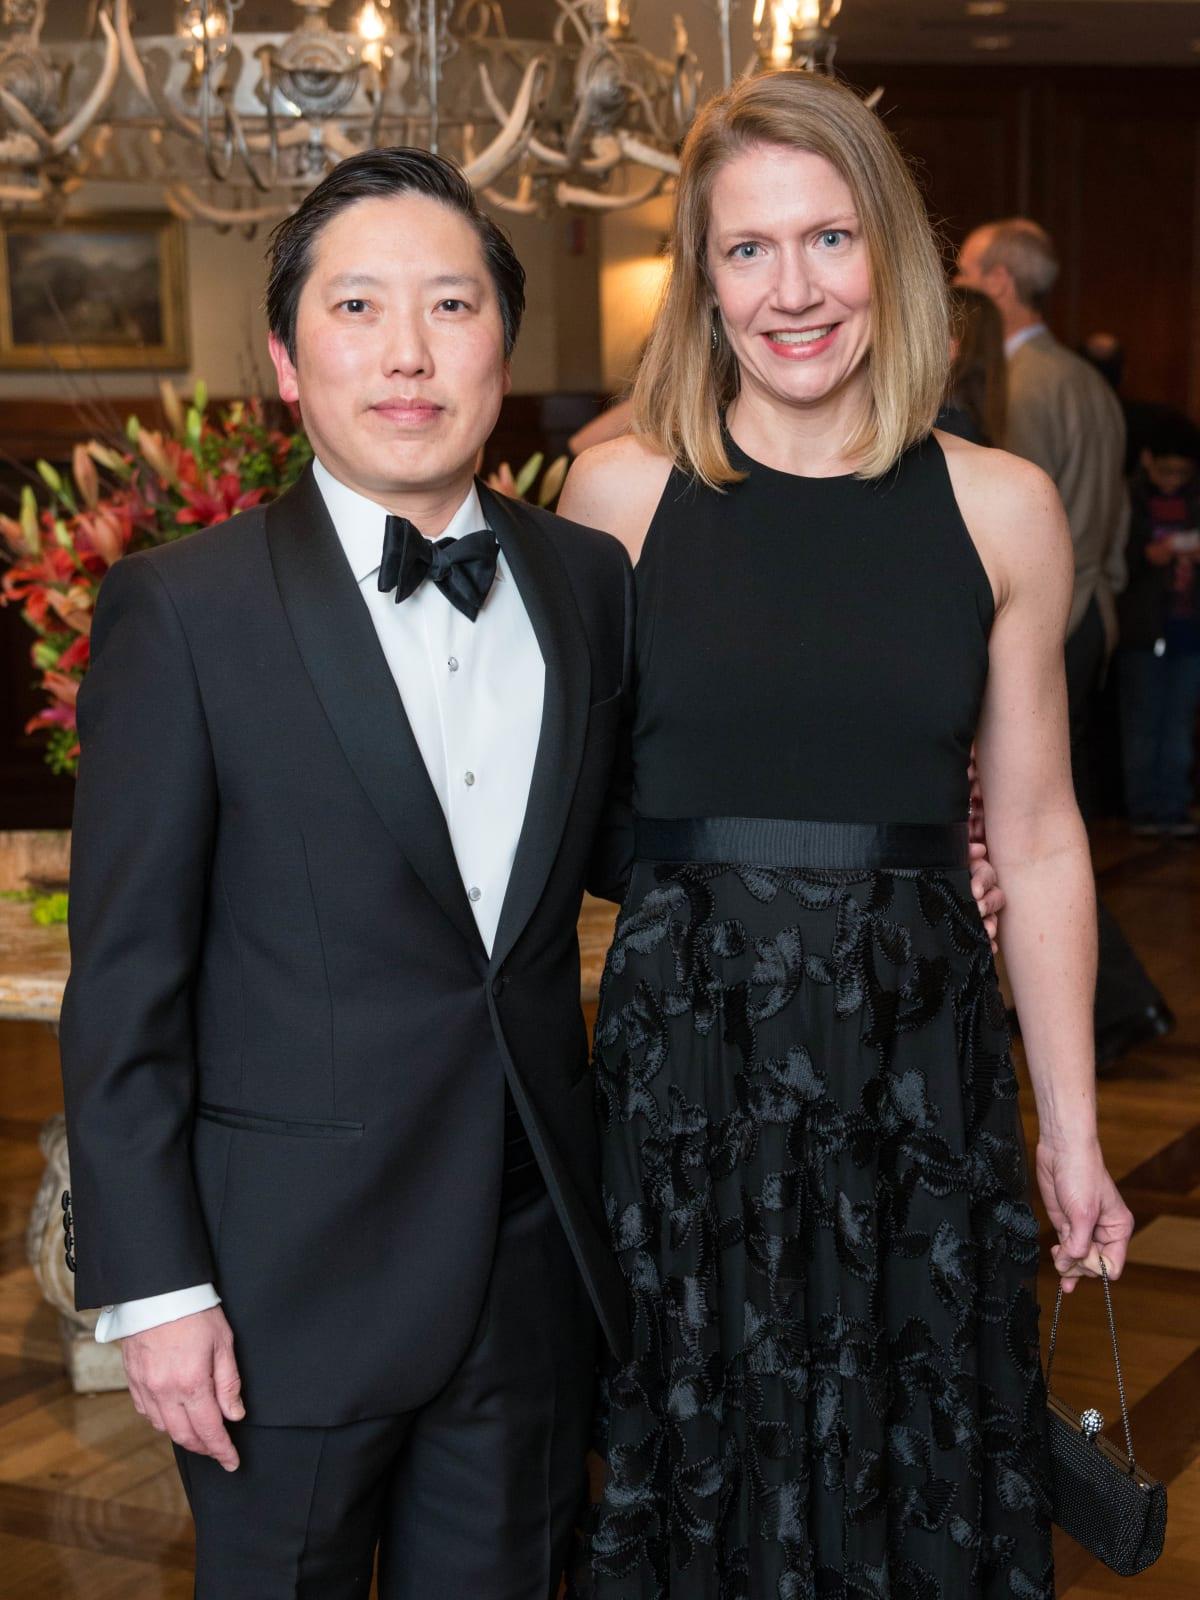 Inprint Poets & Writers Gala 2018:Ba Nguyen and Gwendolyn Dawson